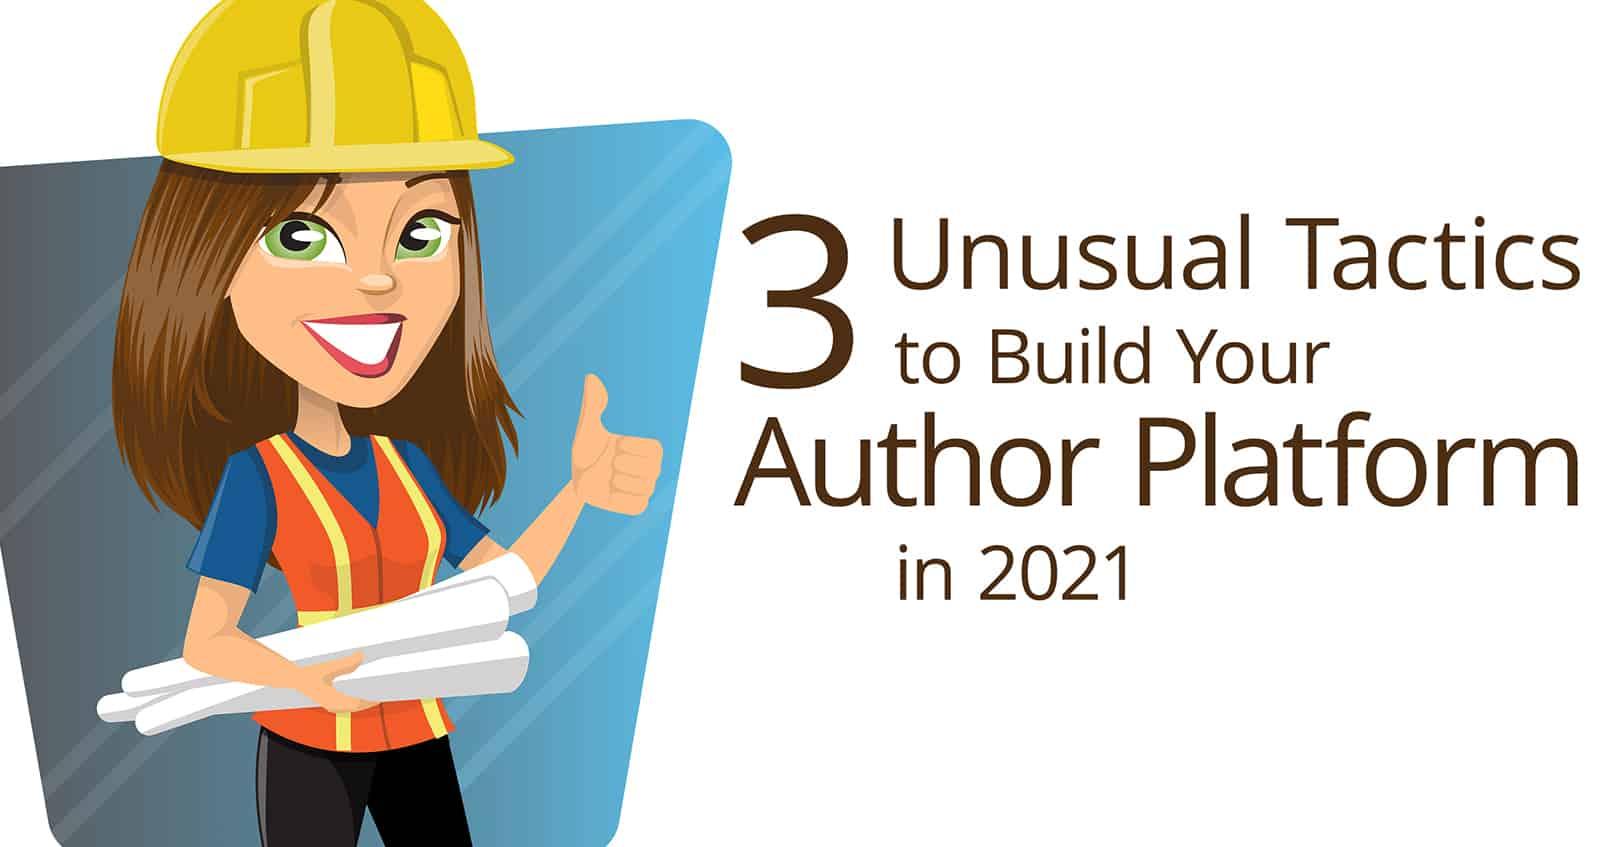 unusual tactics to build your author platform in 2021